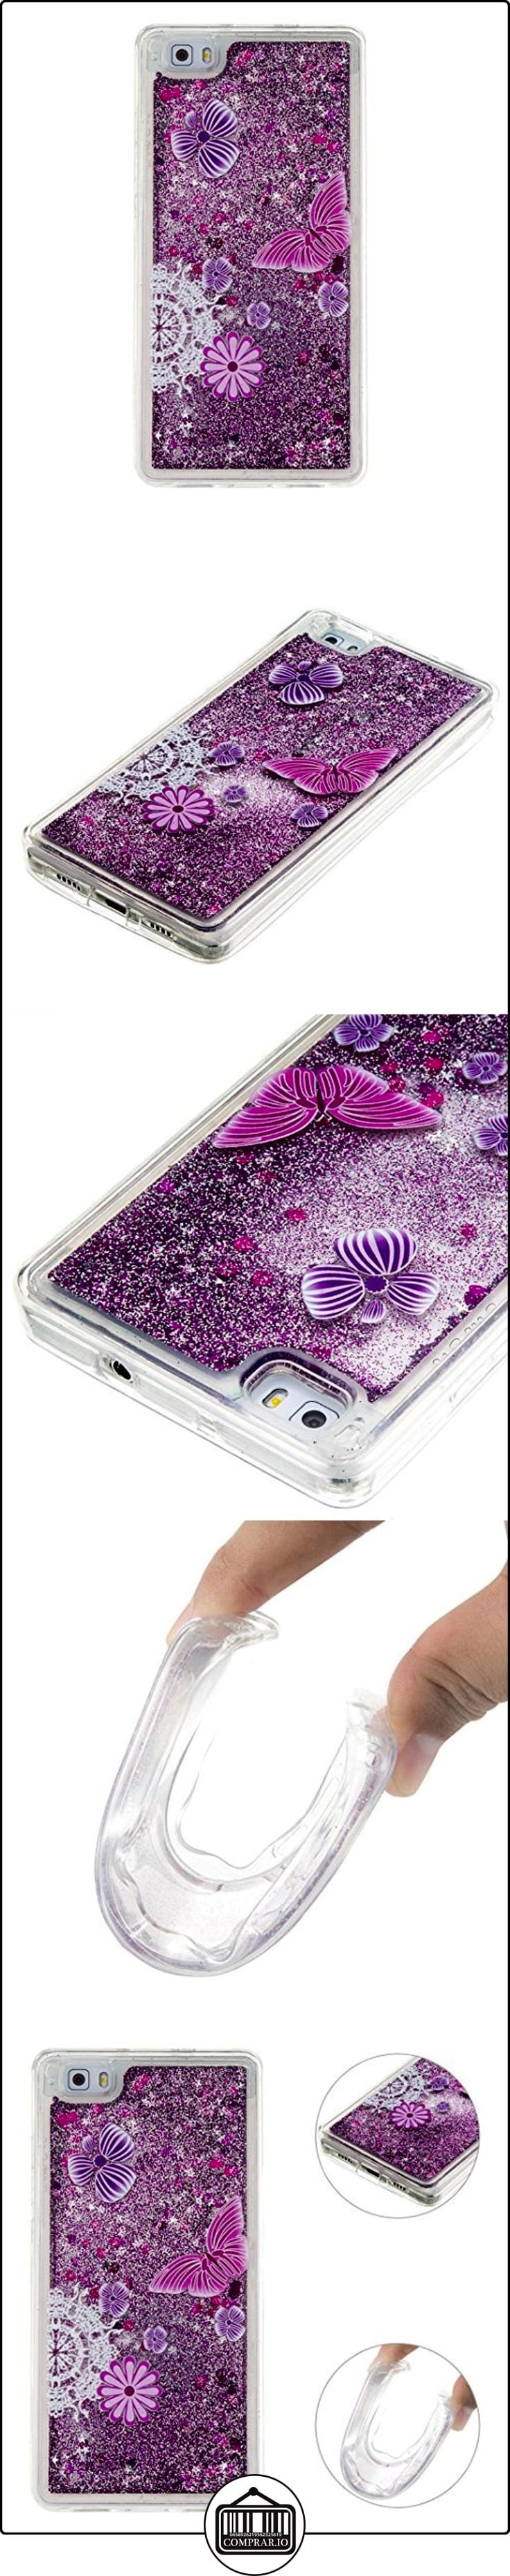 Funda Huawei P8 Lite Púrpura Bling Arena Movediza Lentejuelas Concha Blanda,Moon mood® 3D Moda Fluido Líquido Quicksand Estrellas Case Cubierta para Huawei P8lite Silicona Slim Caso Trasero Sparkle Brillar Glitter Claro Cristal Bumper TPU Soft Shell Caja para Cáscara para Huawei P8 Lite 5.0 pulgada  ✿ Regalos para recién nacidos - Bebes ✿ ▬► Ver oferta: http://comprar.io/goto/B01N5CPS9K